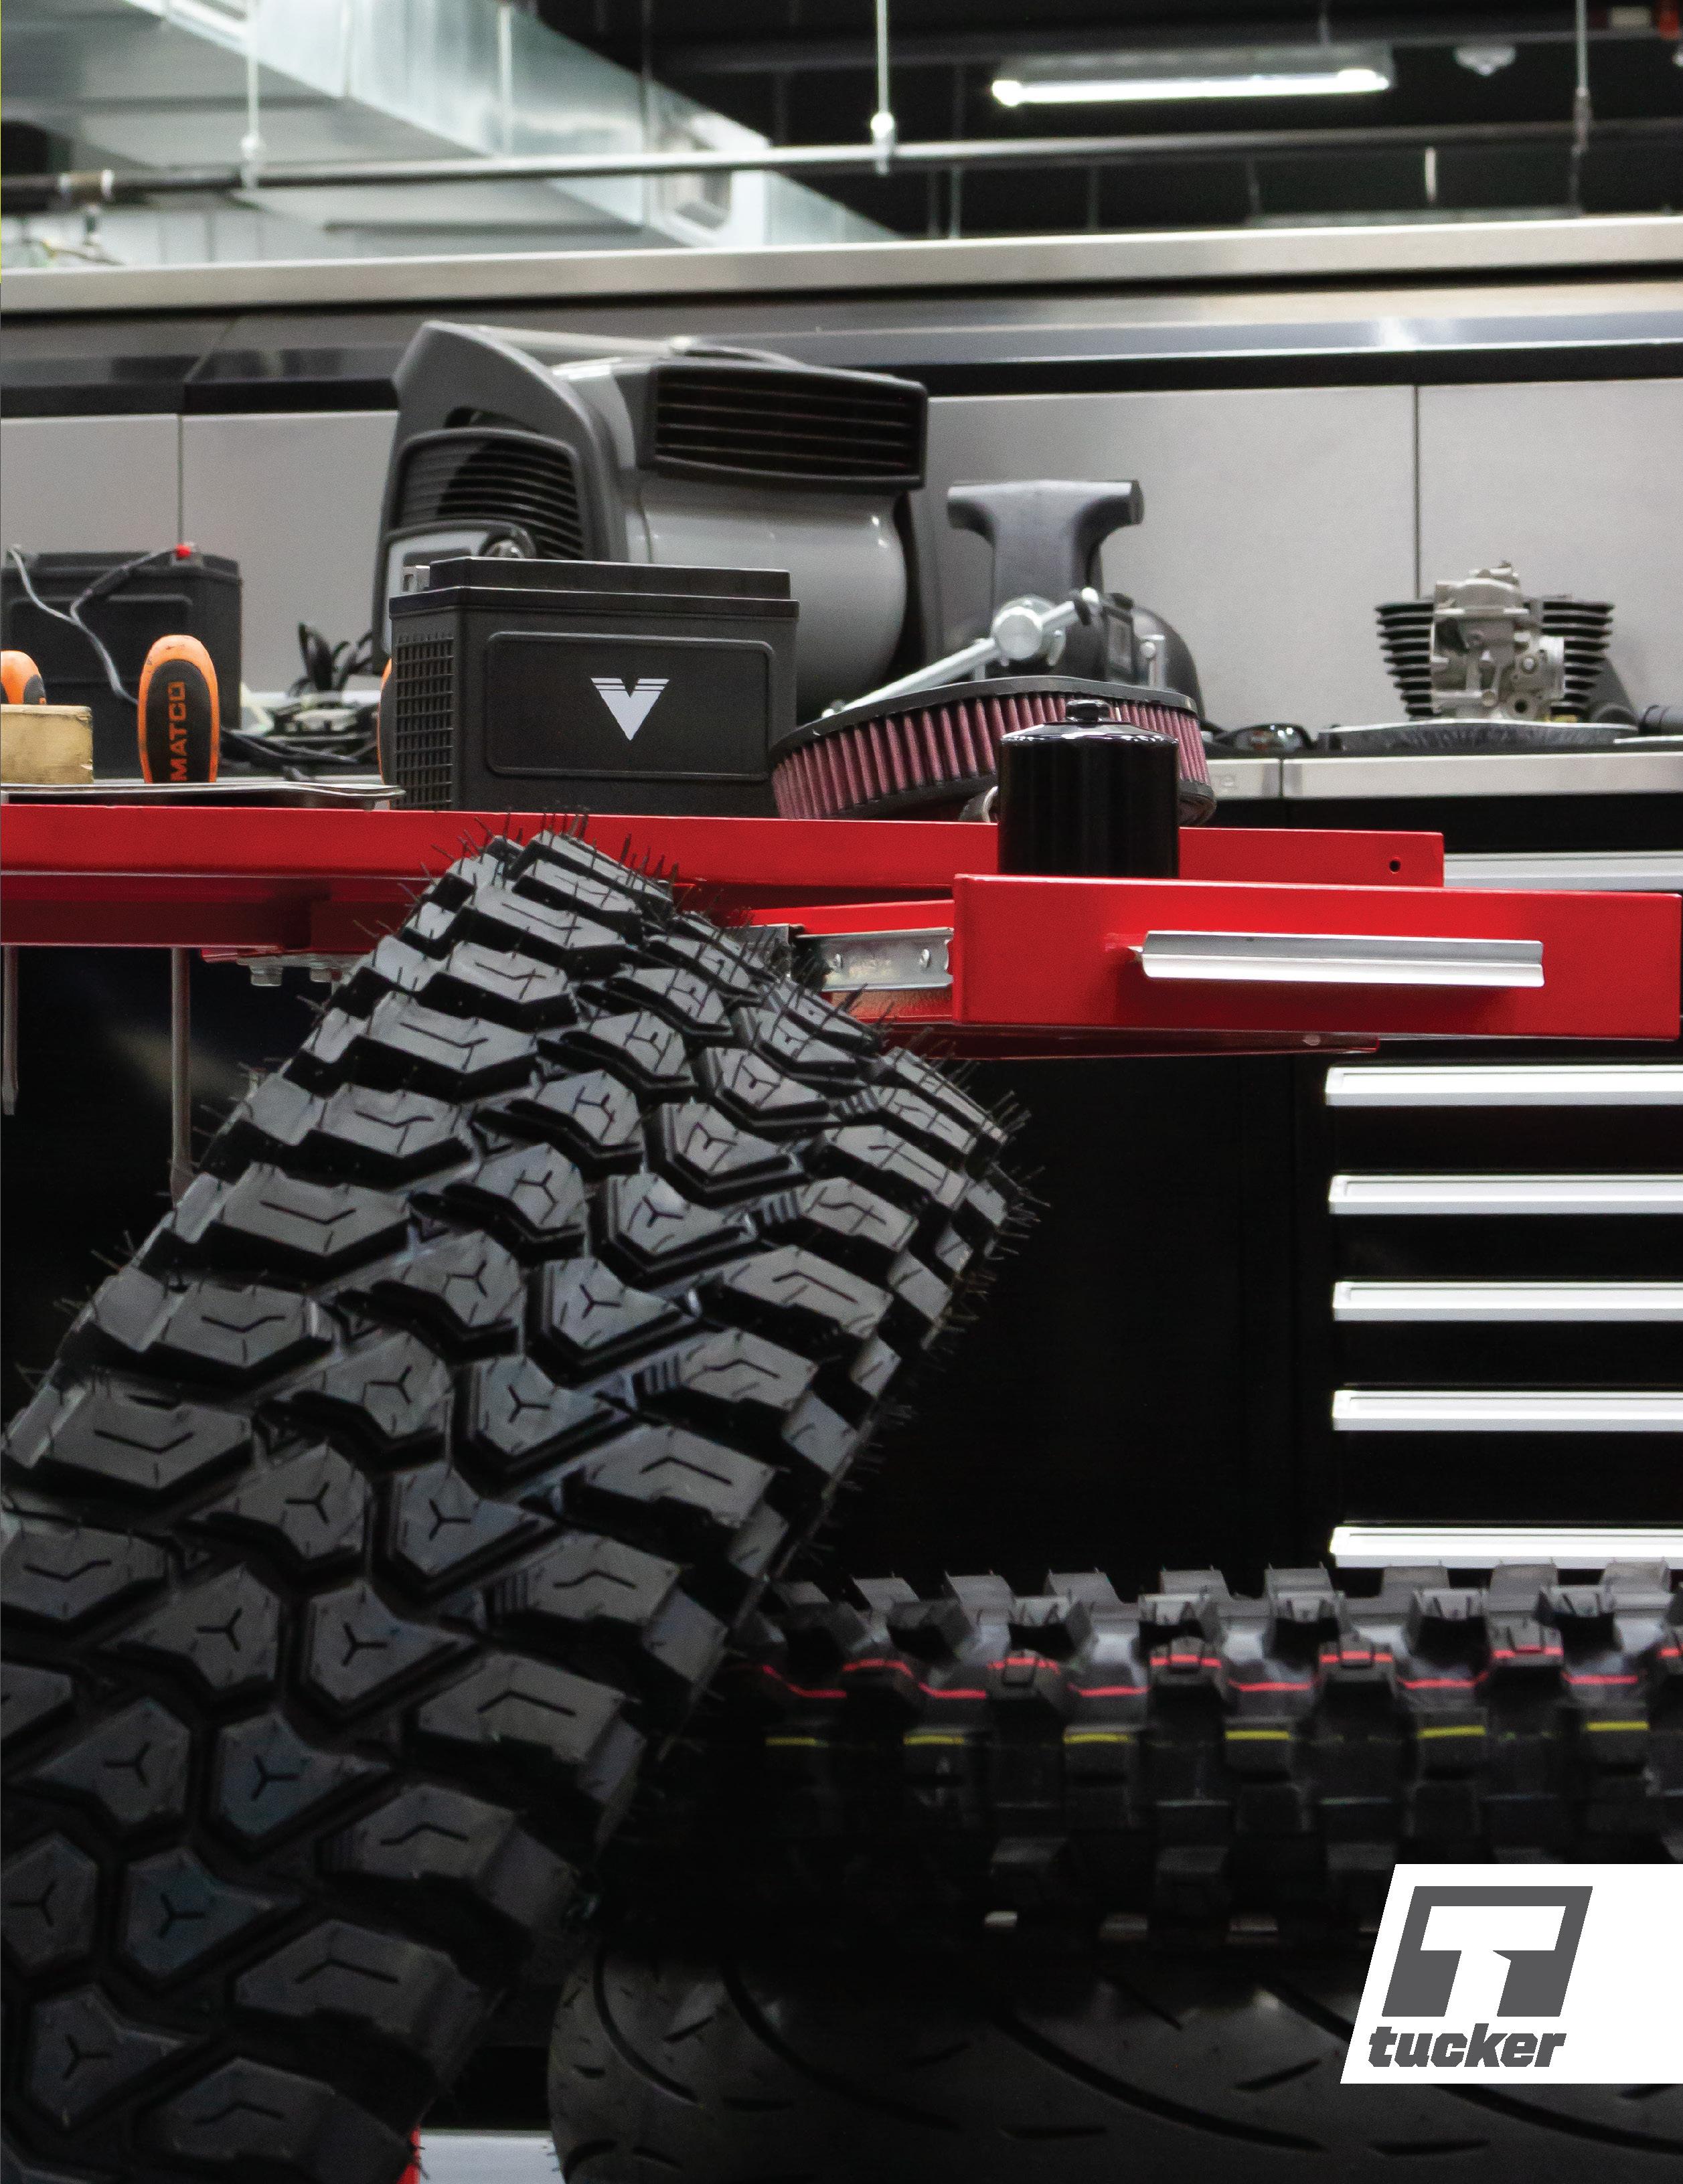 2020 Tucker - Tires - Shop - Service